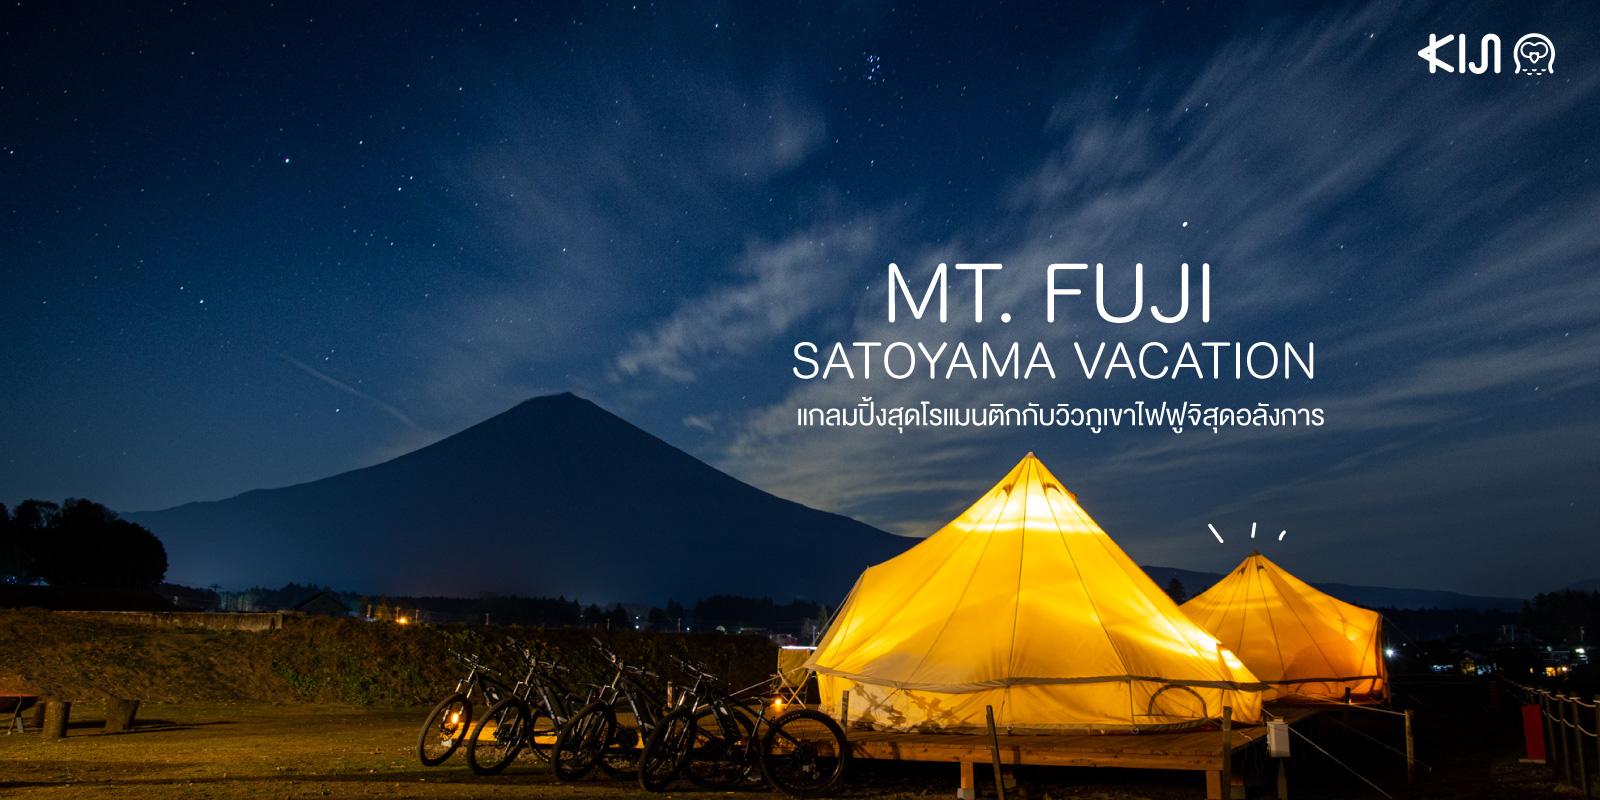 MT. FUJI SATOYAMA VACATION แกลมปิ้ง ภูเขาไฟฟูจิ